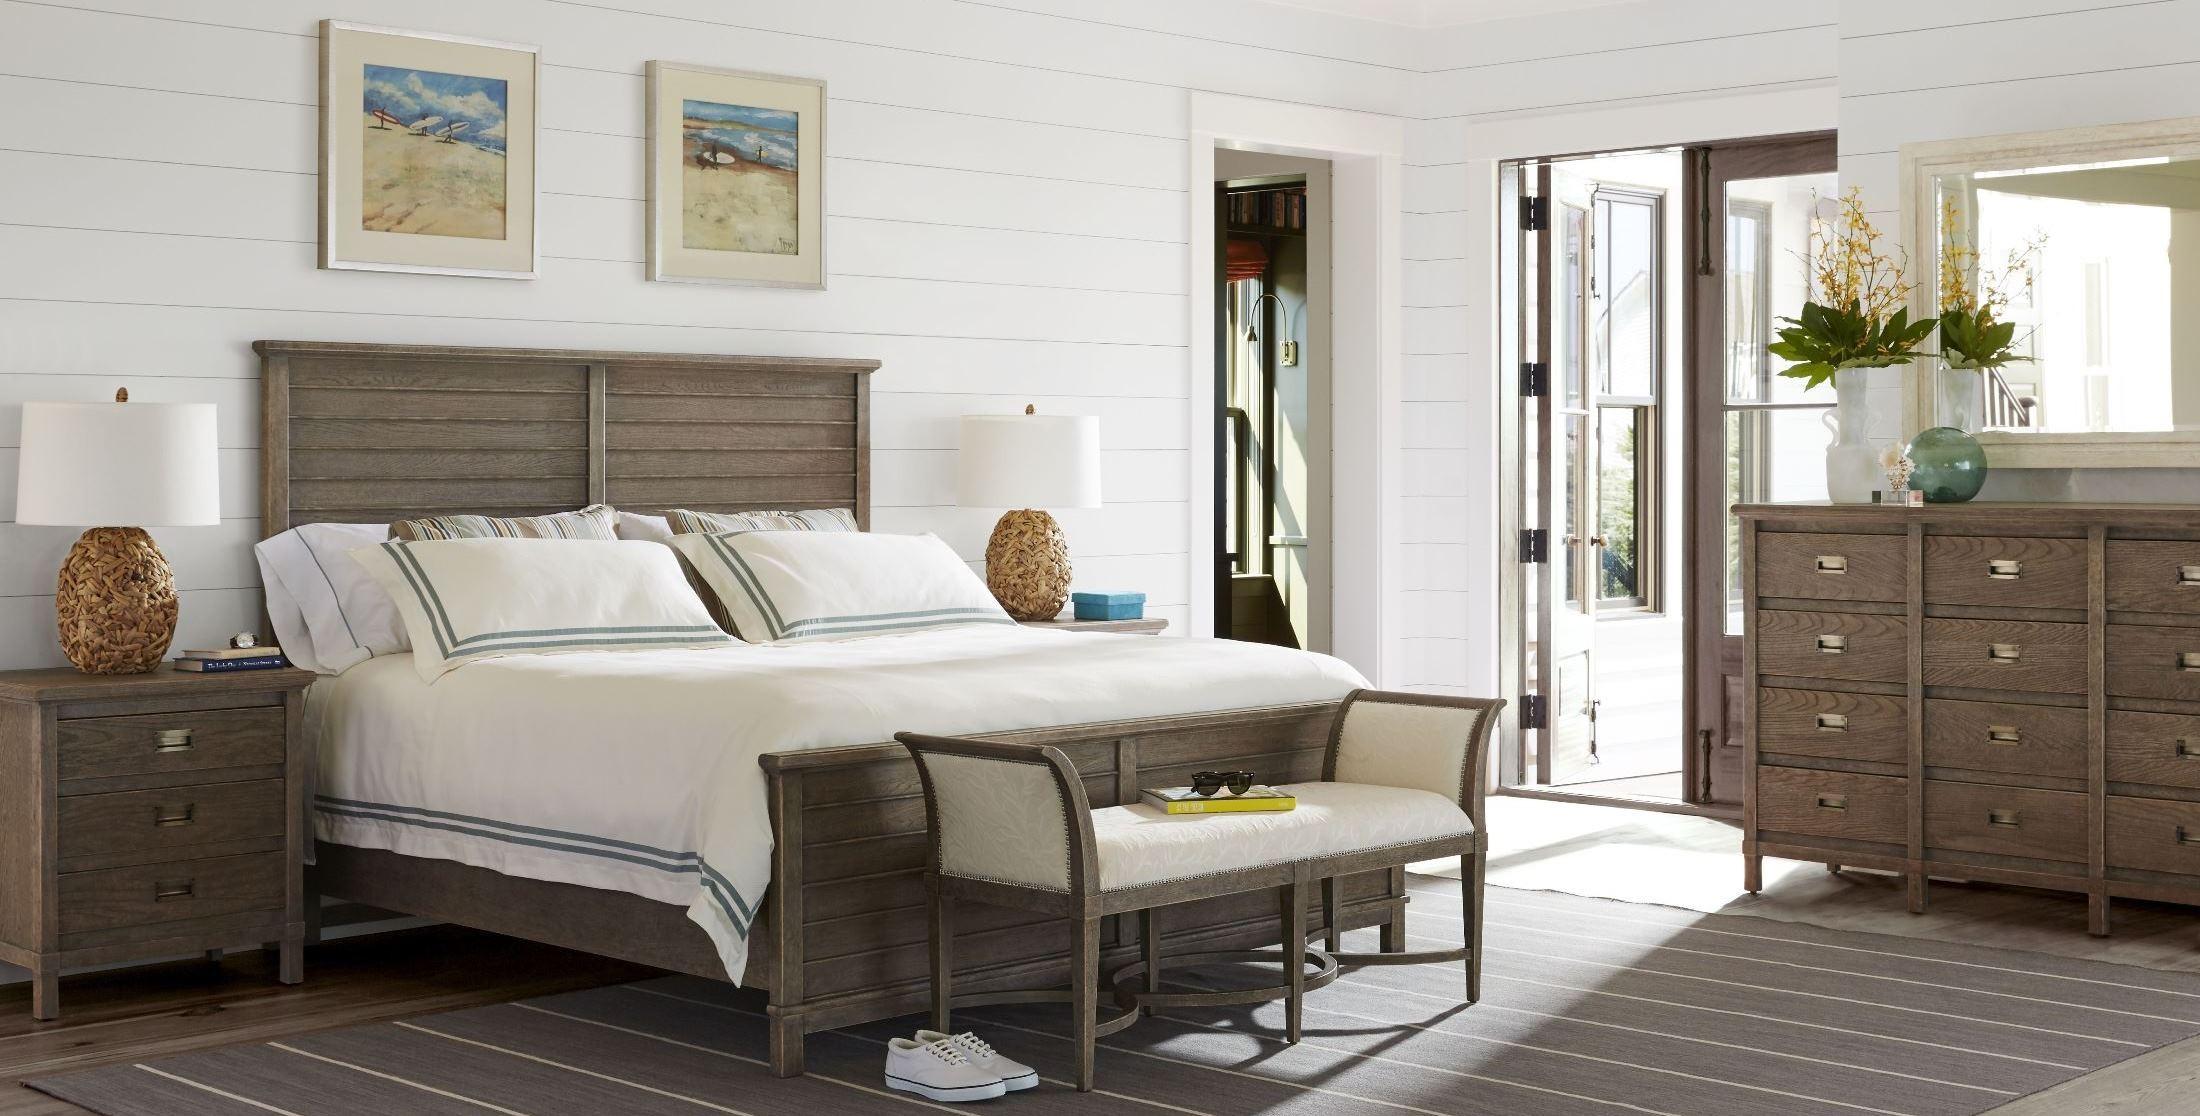 coastal living resort deck cape comber bedroom set from